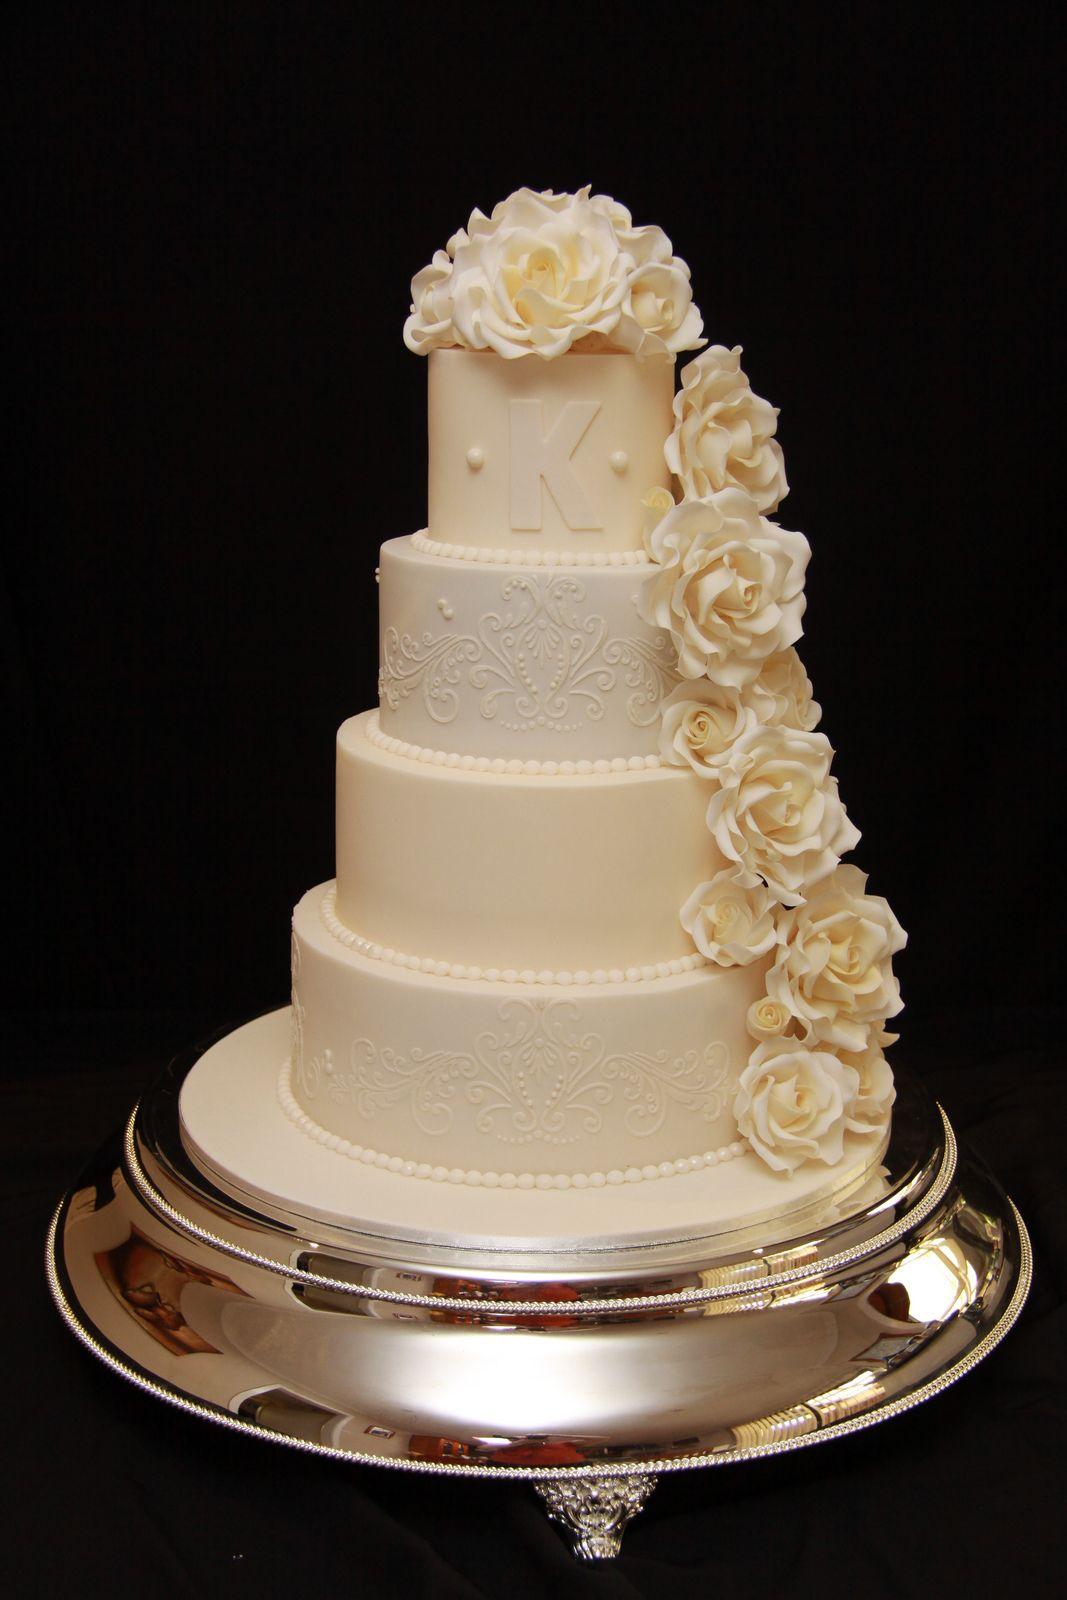 Pin by vanda desiree on wedding cakes pinterest wedding